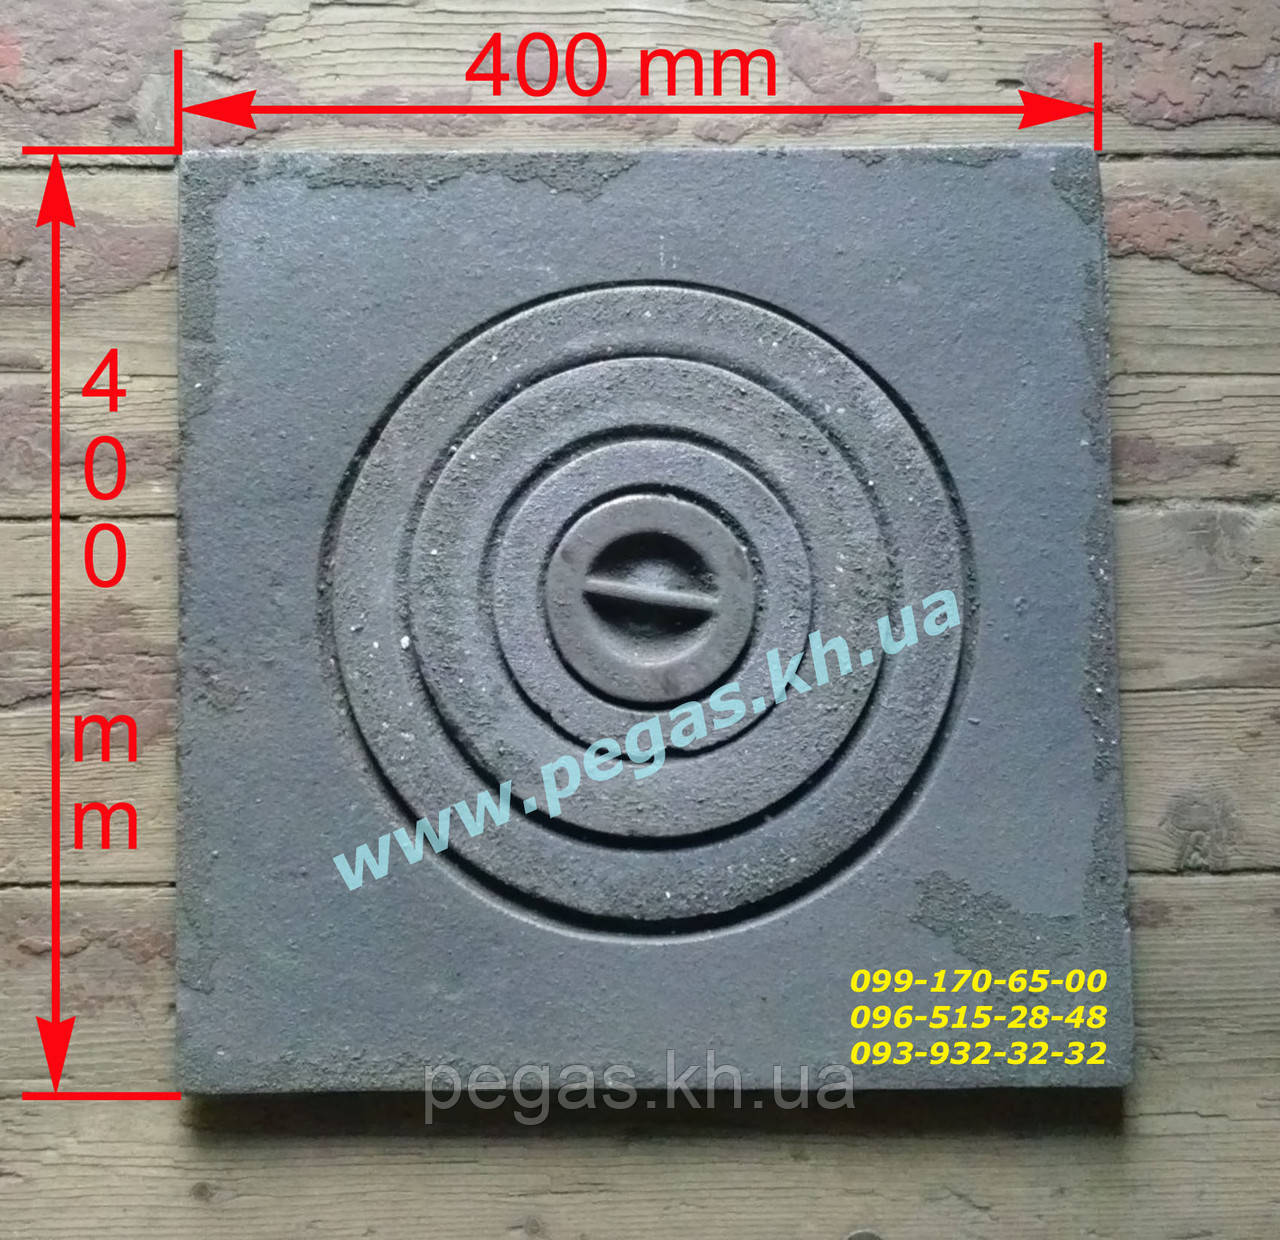 Плита чугунная (400х400 мм) грубу, мангал, барбекю